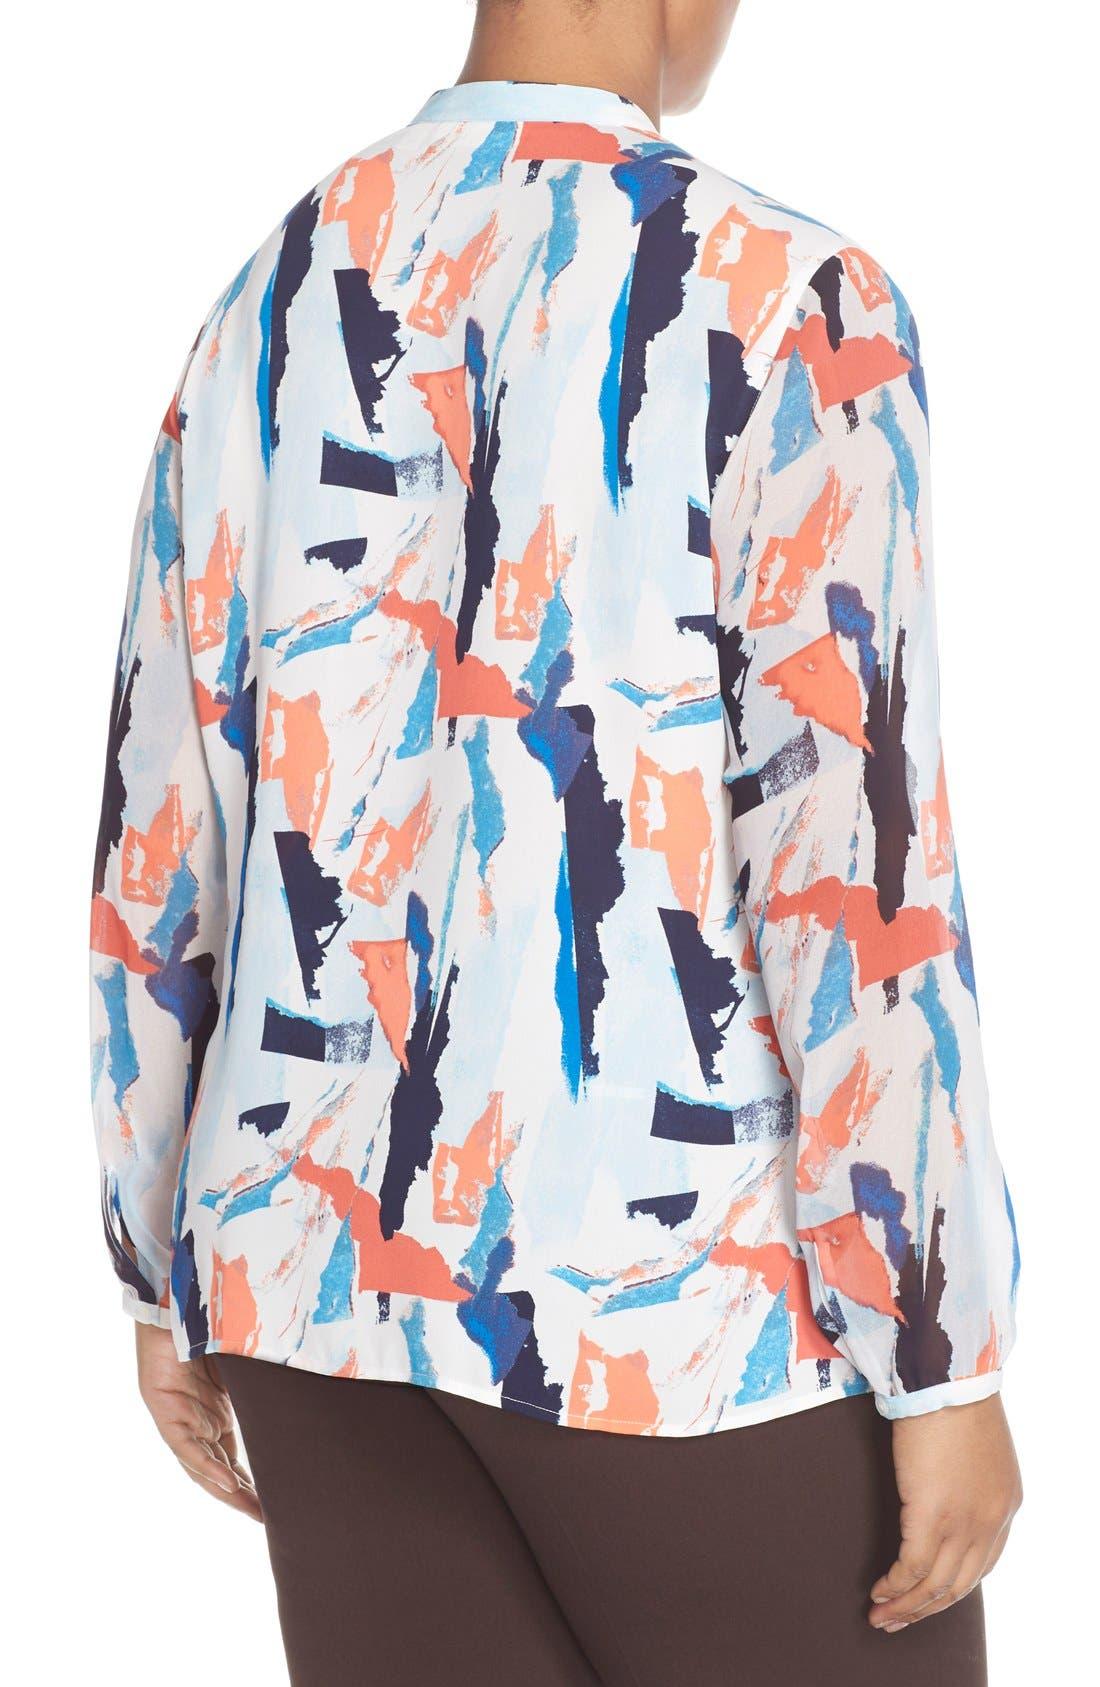 Sheer Sleeve Split Neck Blouse,                             Alternate thumbnail 2, color,                             Blue Abstract Ship Print